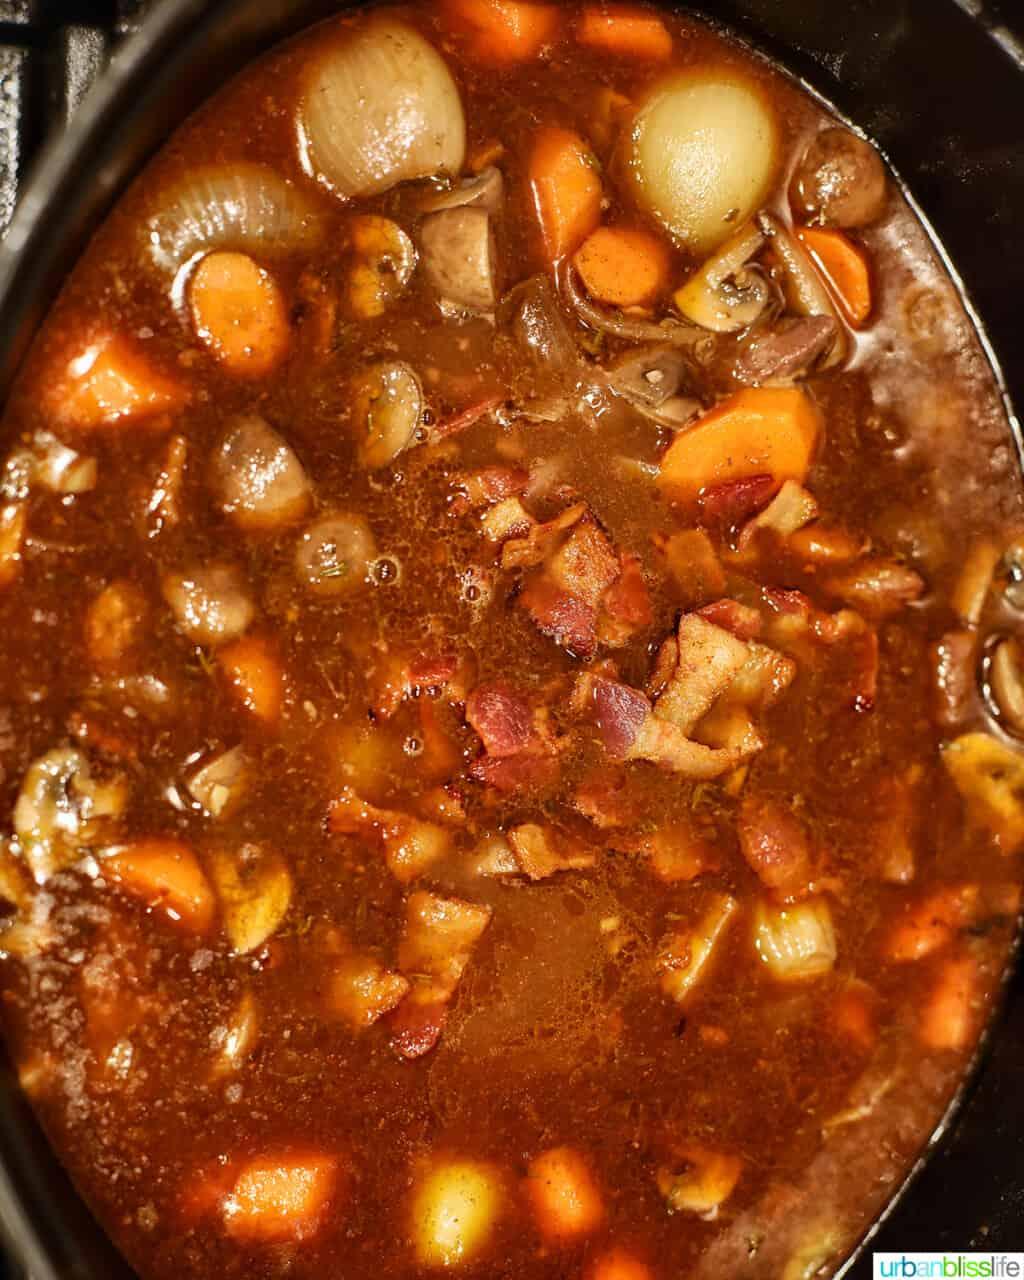 beef bourguignon cooking in pot